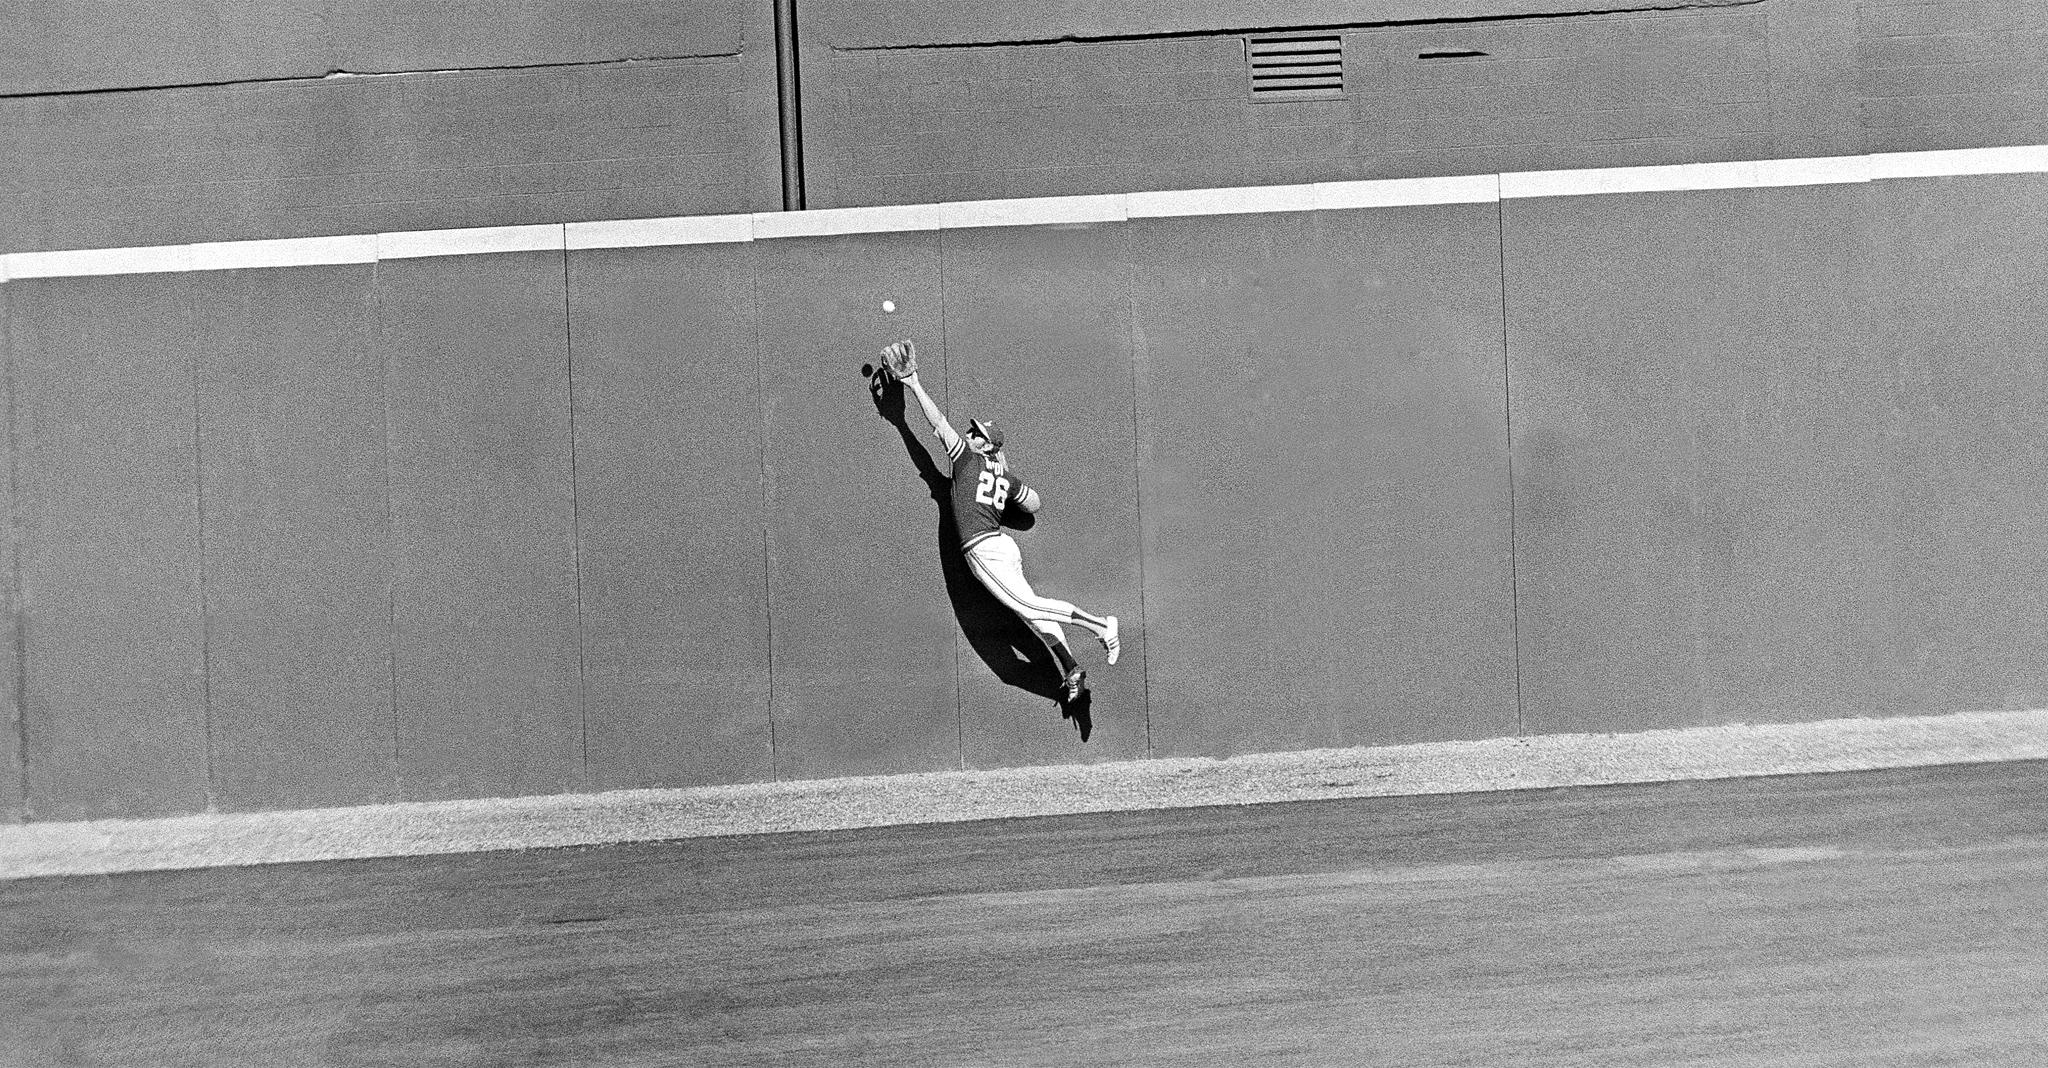 Joe Rudi: 1972 World Series, Game 2 - Greatest OF catches in MLB postseason  history - ESPN